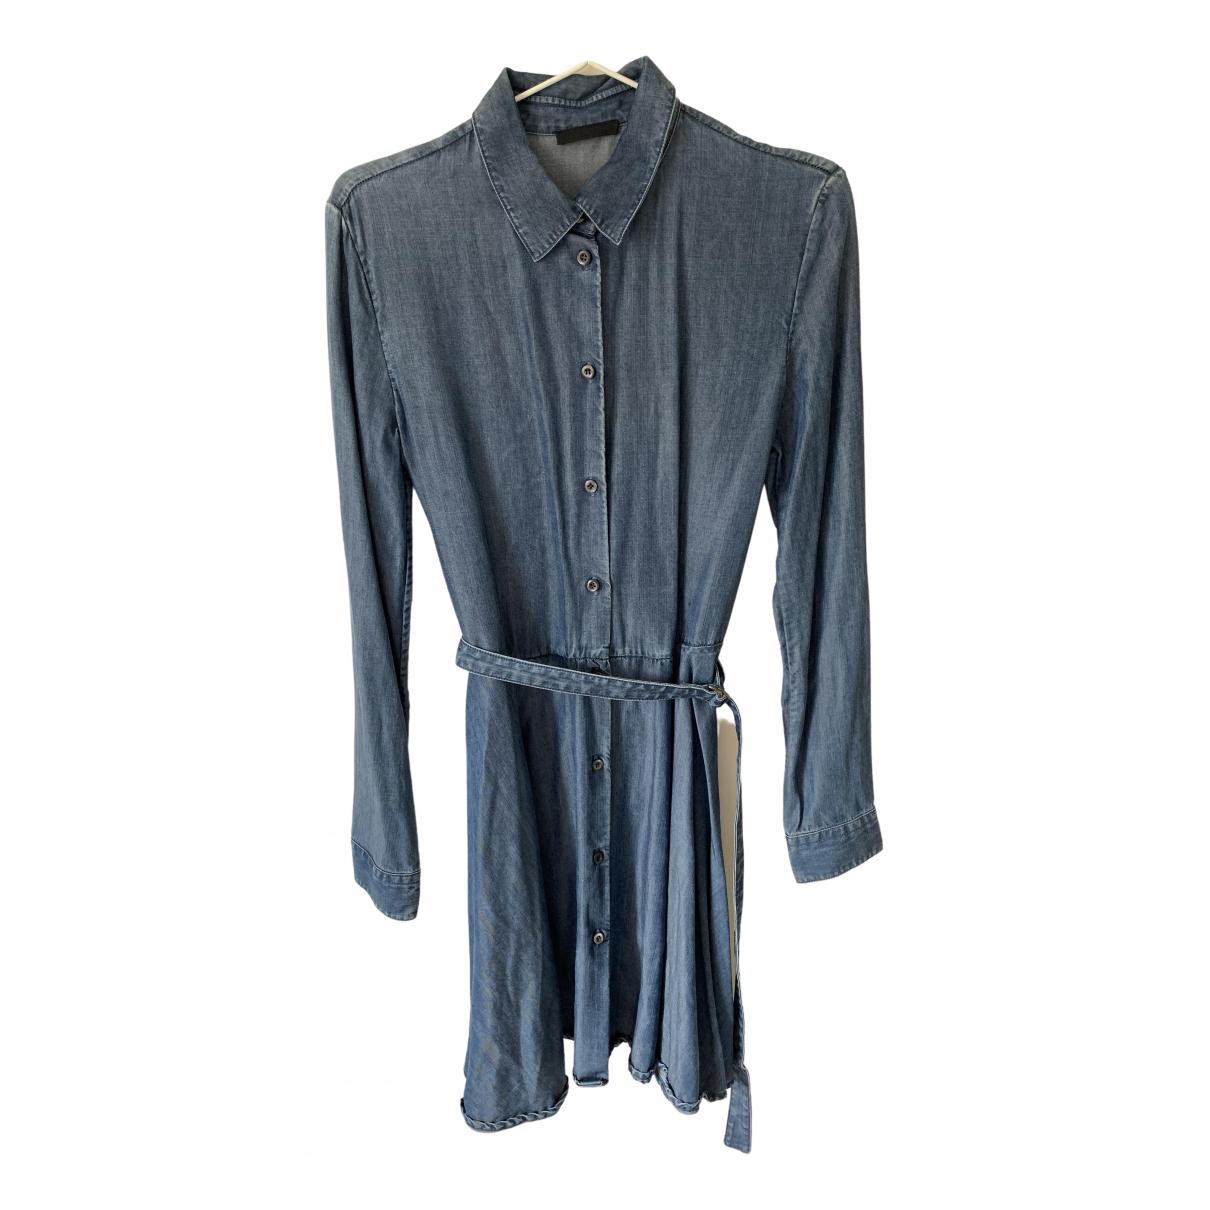 Prada \N Blue Denim - Jeans dress for Women 42 IT